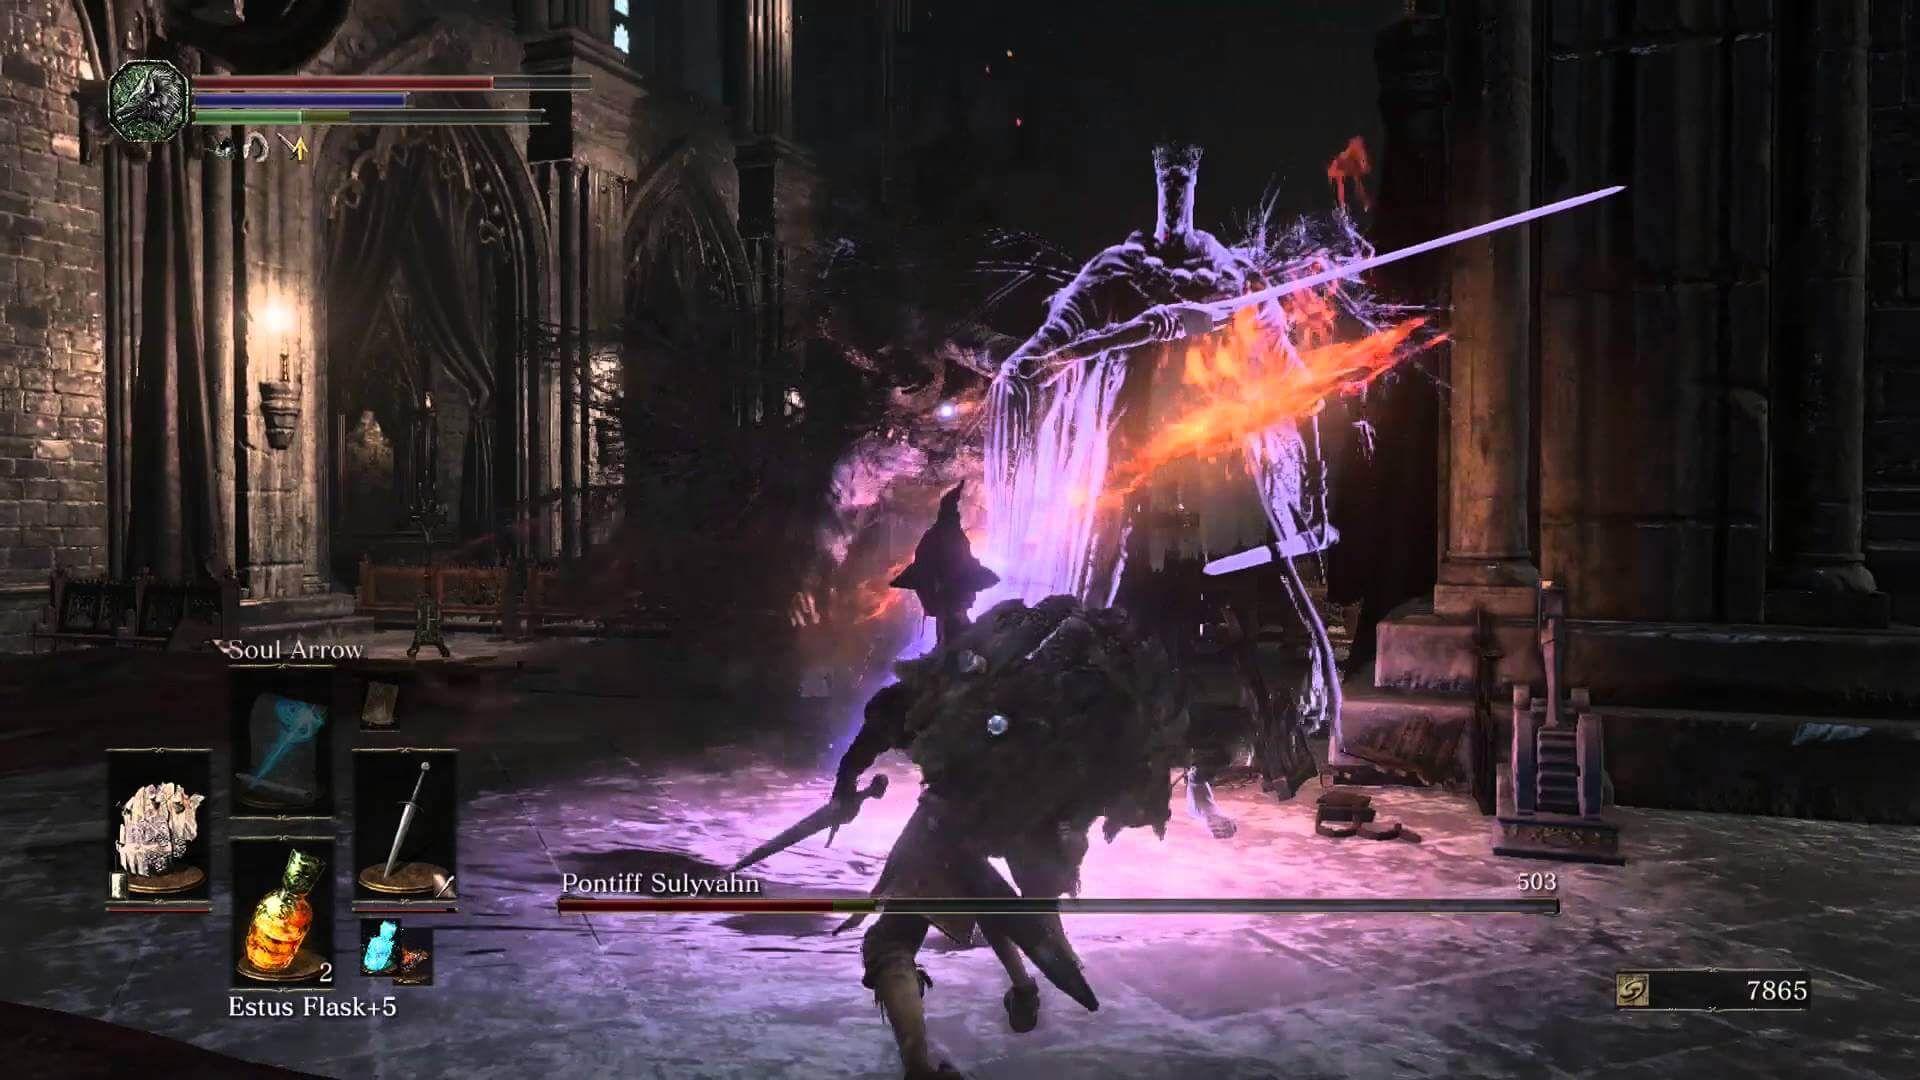 Dark Souls 3 Boss Guide: How to Beat Pontiff Sulyvahn | Game Rant